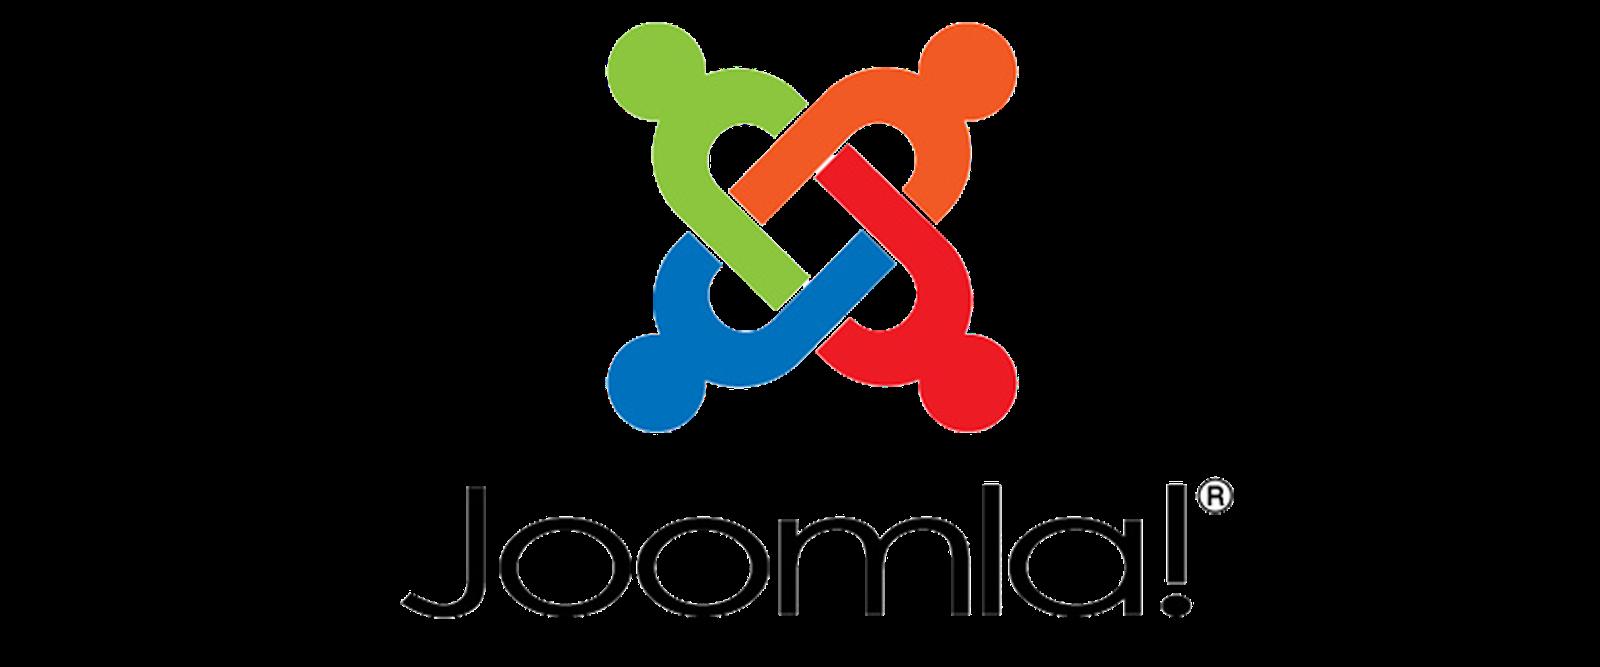 Joomla PNG Transparent Joomla.PNG Images..